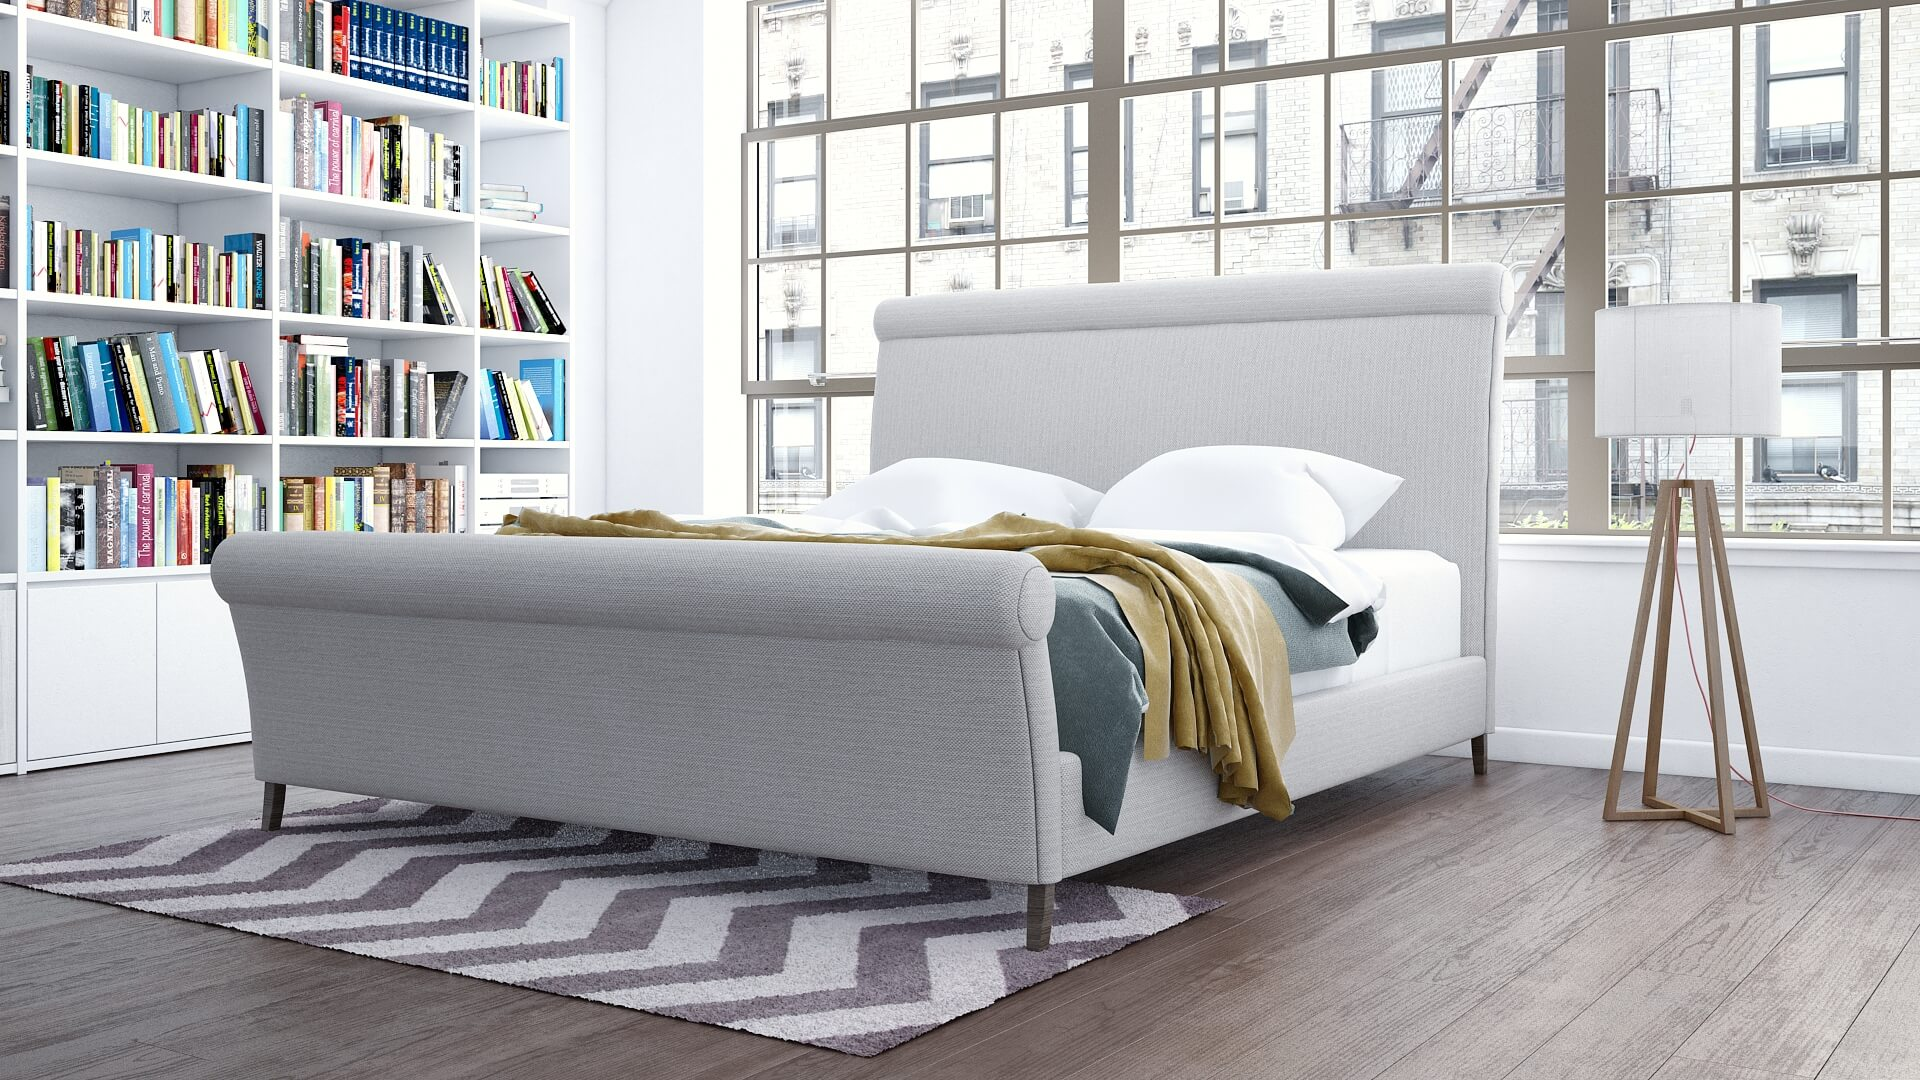 maja bed furniture gallery 1